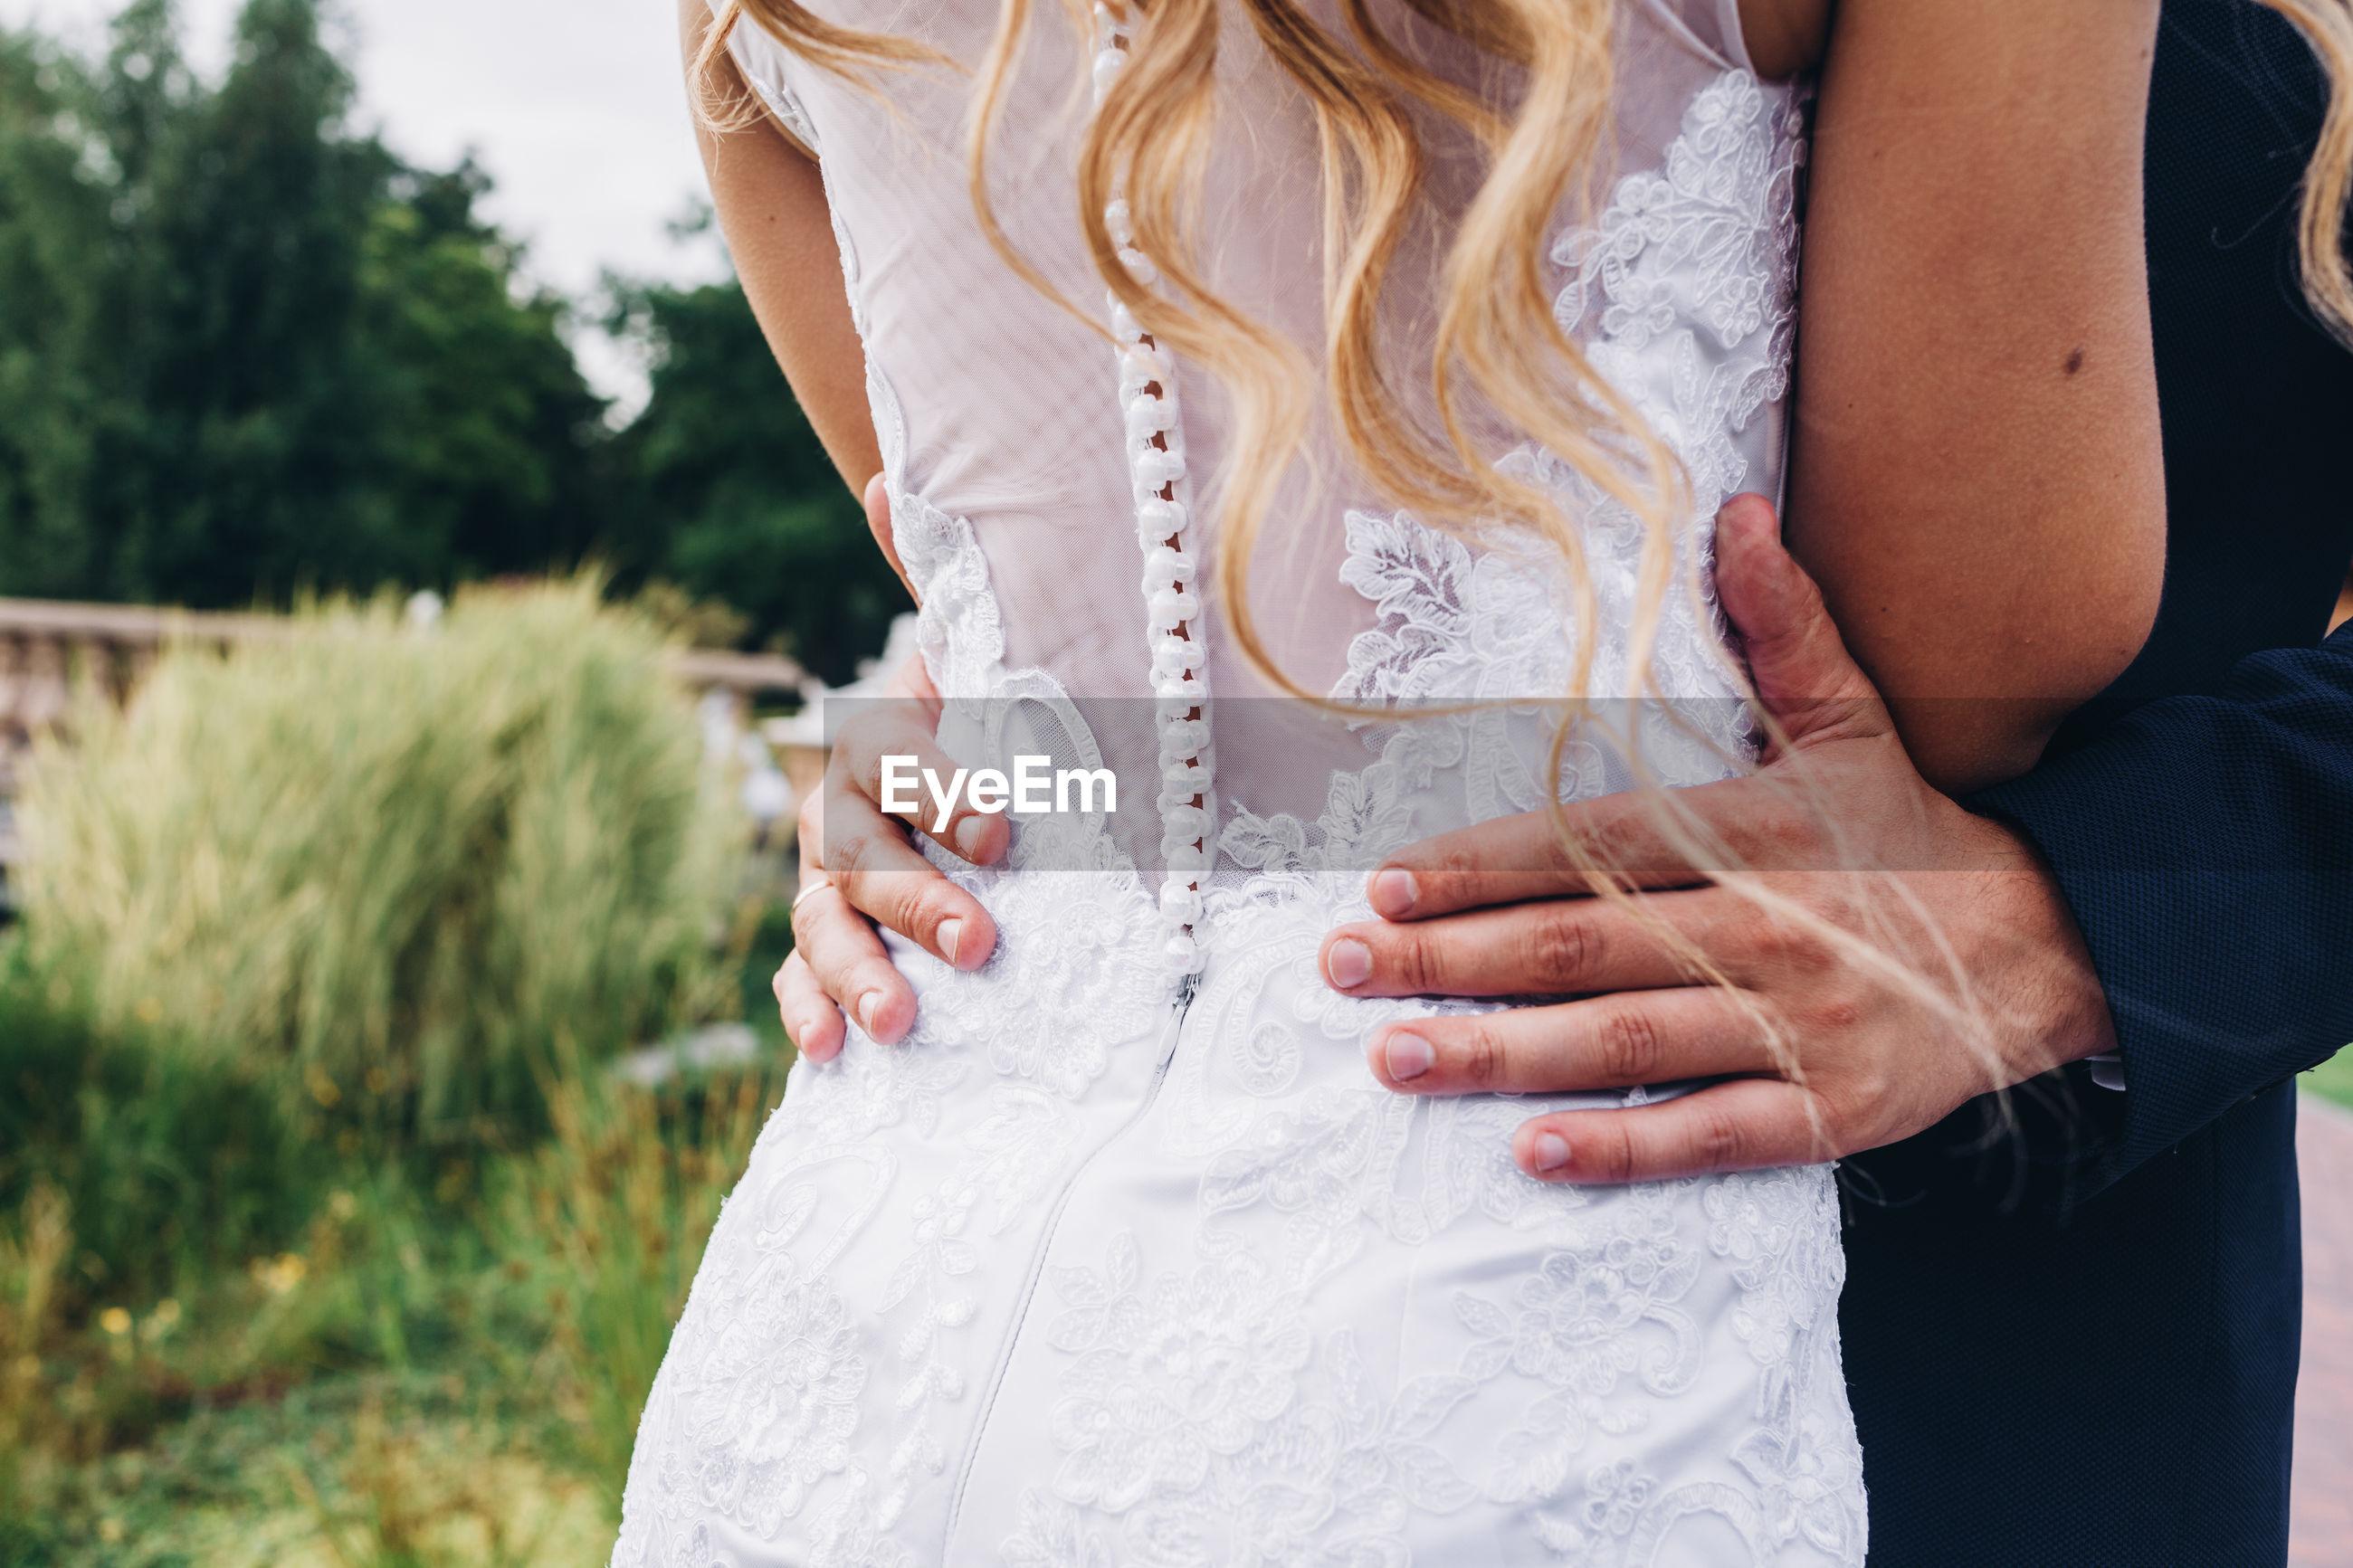 Midsection of bride embracing bridegroom during wedding ceremony